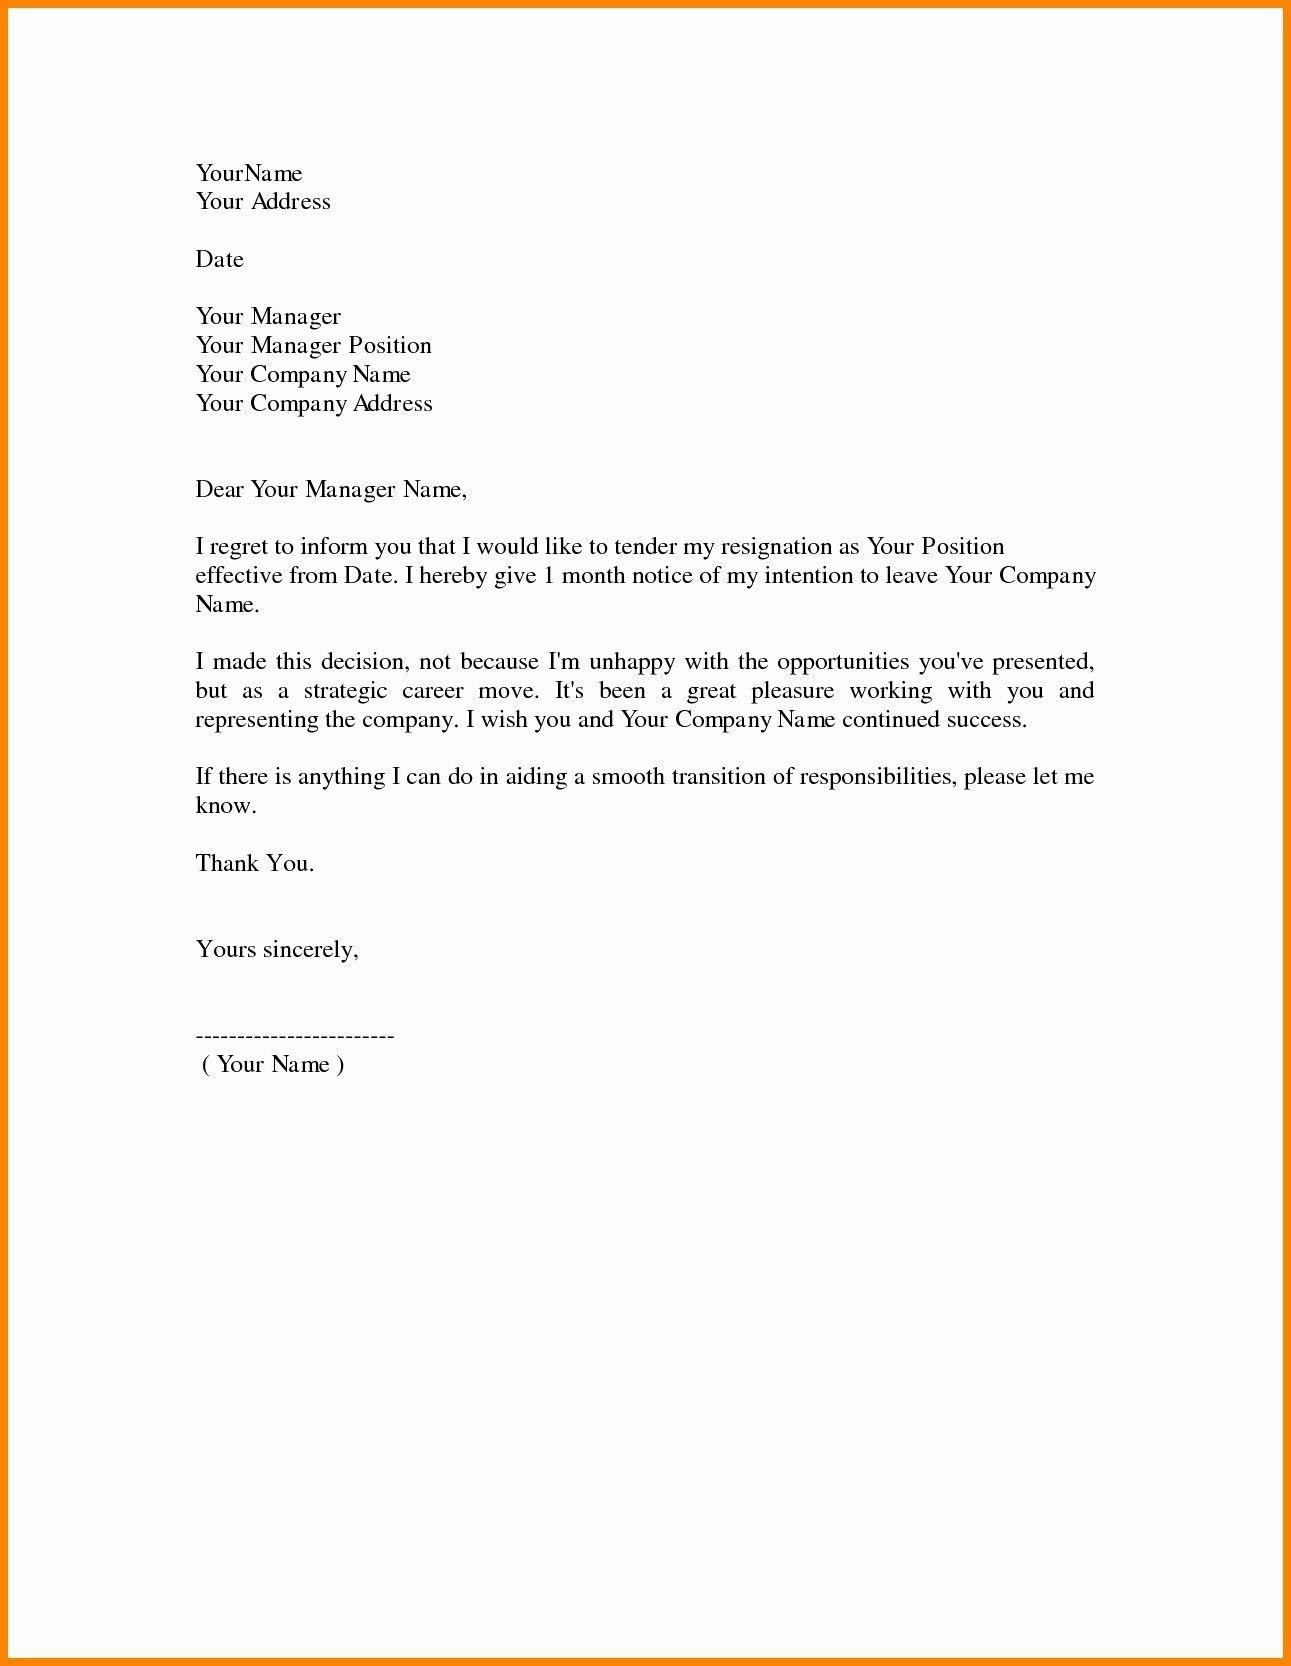 Image result for resignation letter HD  Microsoft word  Resignation letter Job cover letter